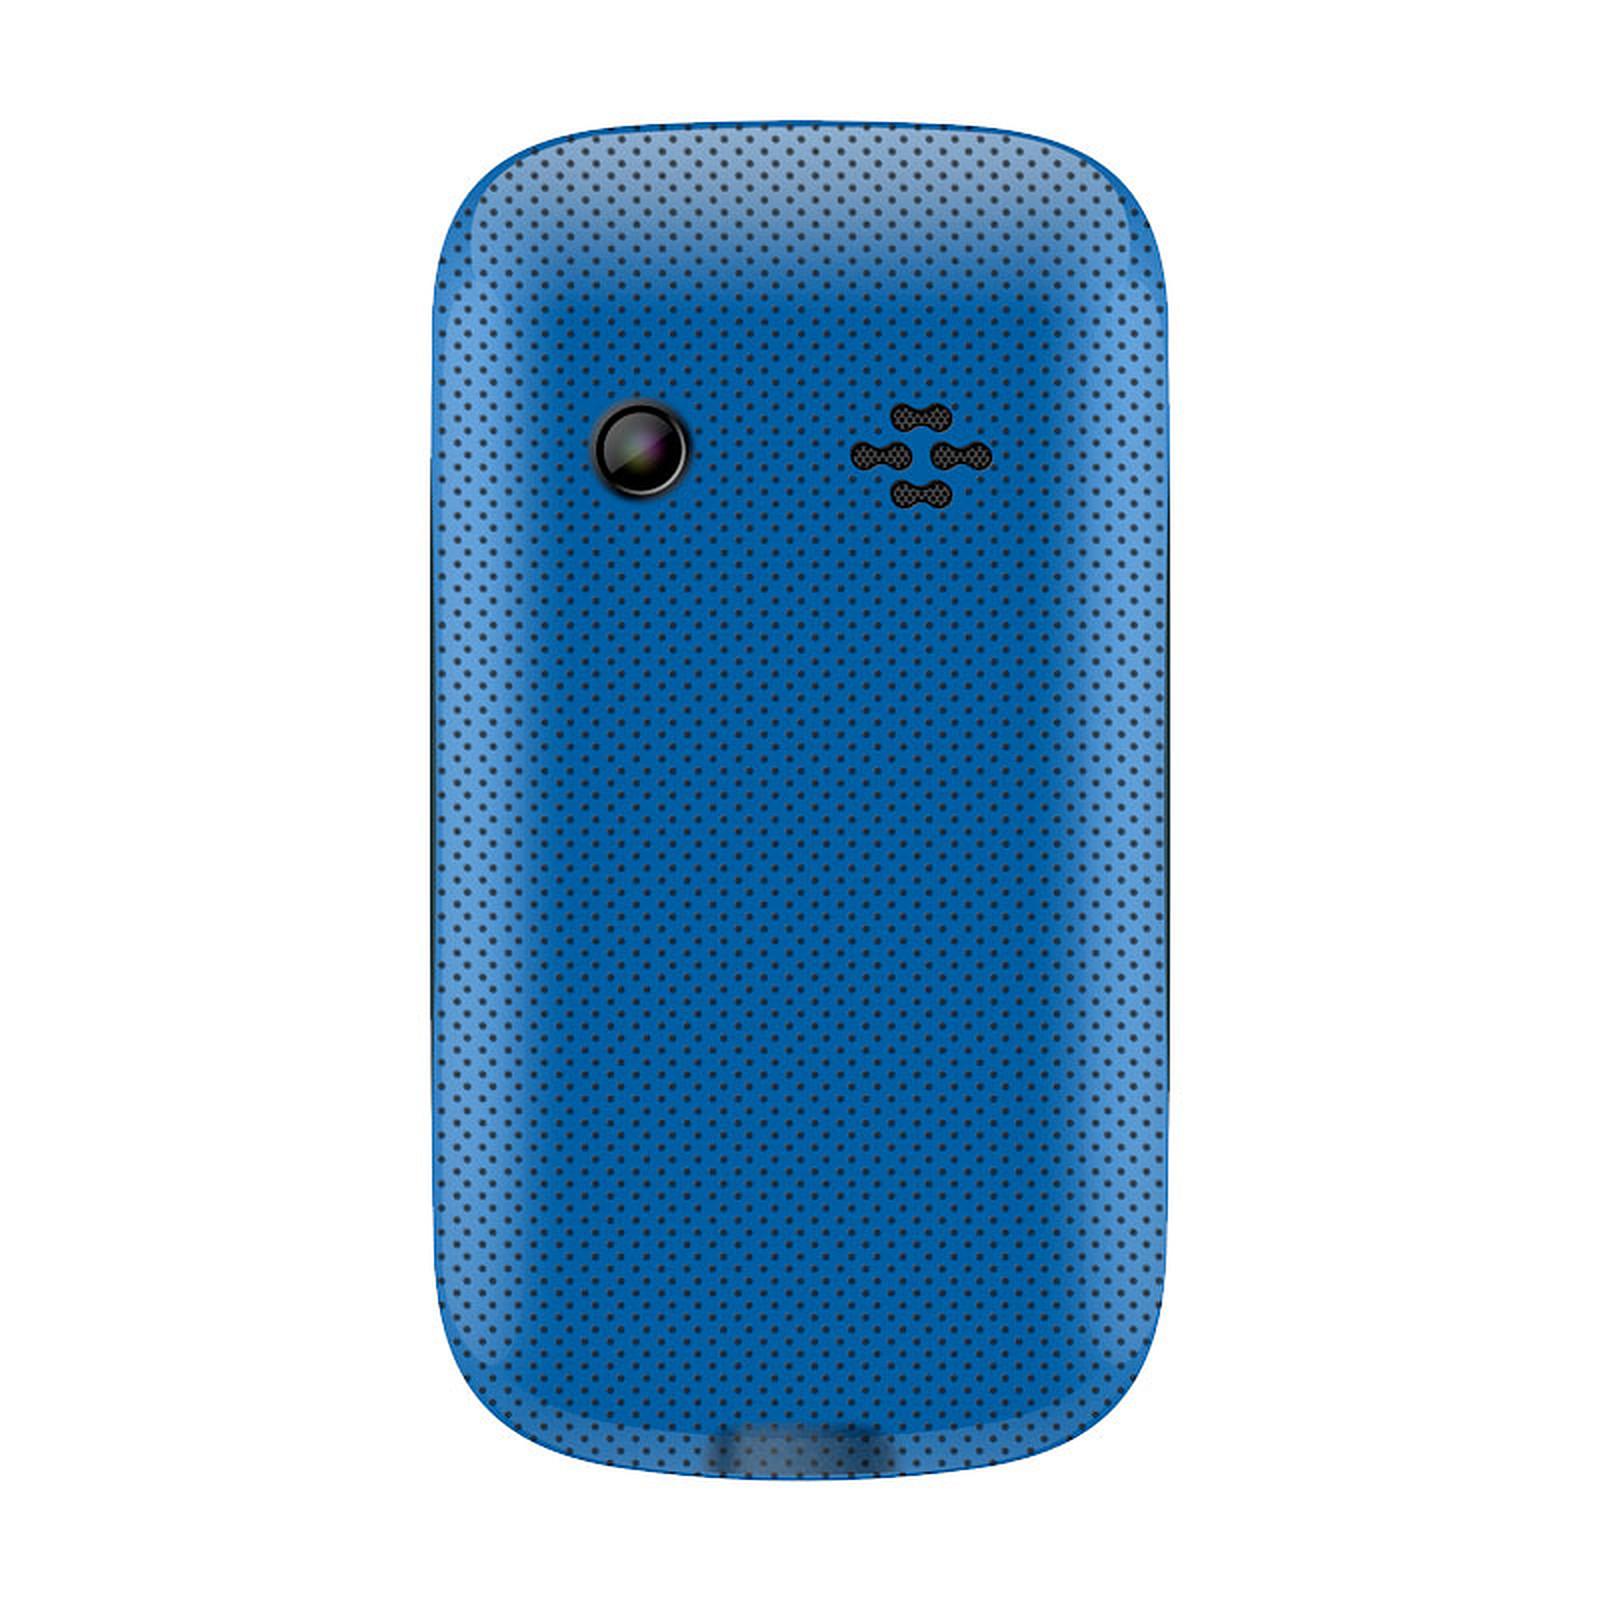 Wiko Minz Bleu - Mobile & smartphone Wiko sur LDLC   Muséericorde